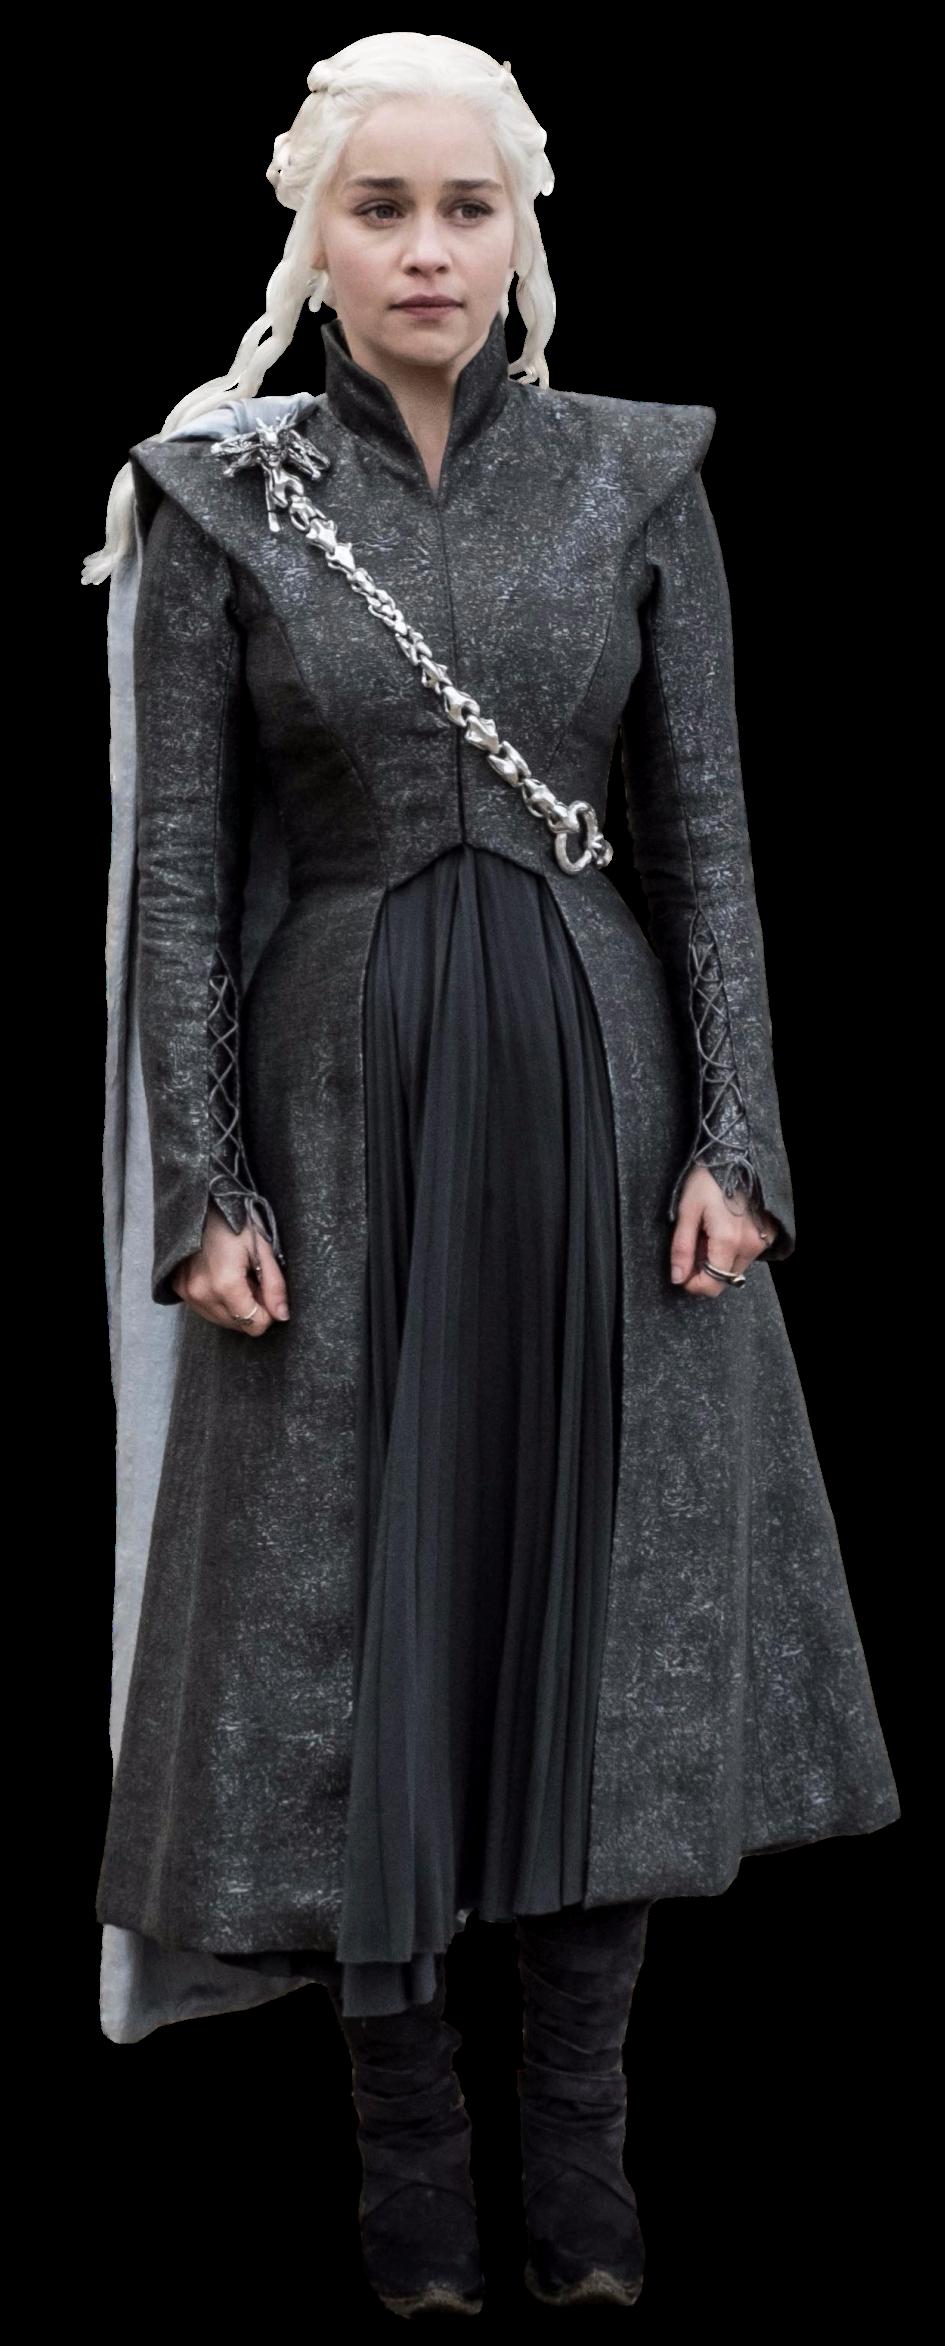 Game Of Thrones Daenerys Targaryen By Camo Flauge Dblgxop Png 945 2346 Juego De Tronos Arte Juego De Tronos Indumentaria